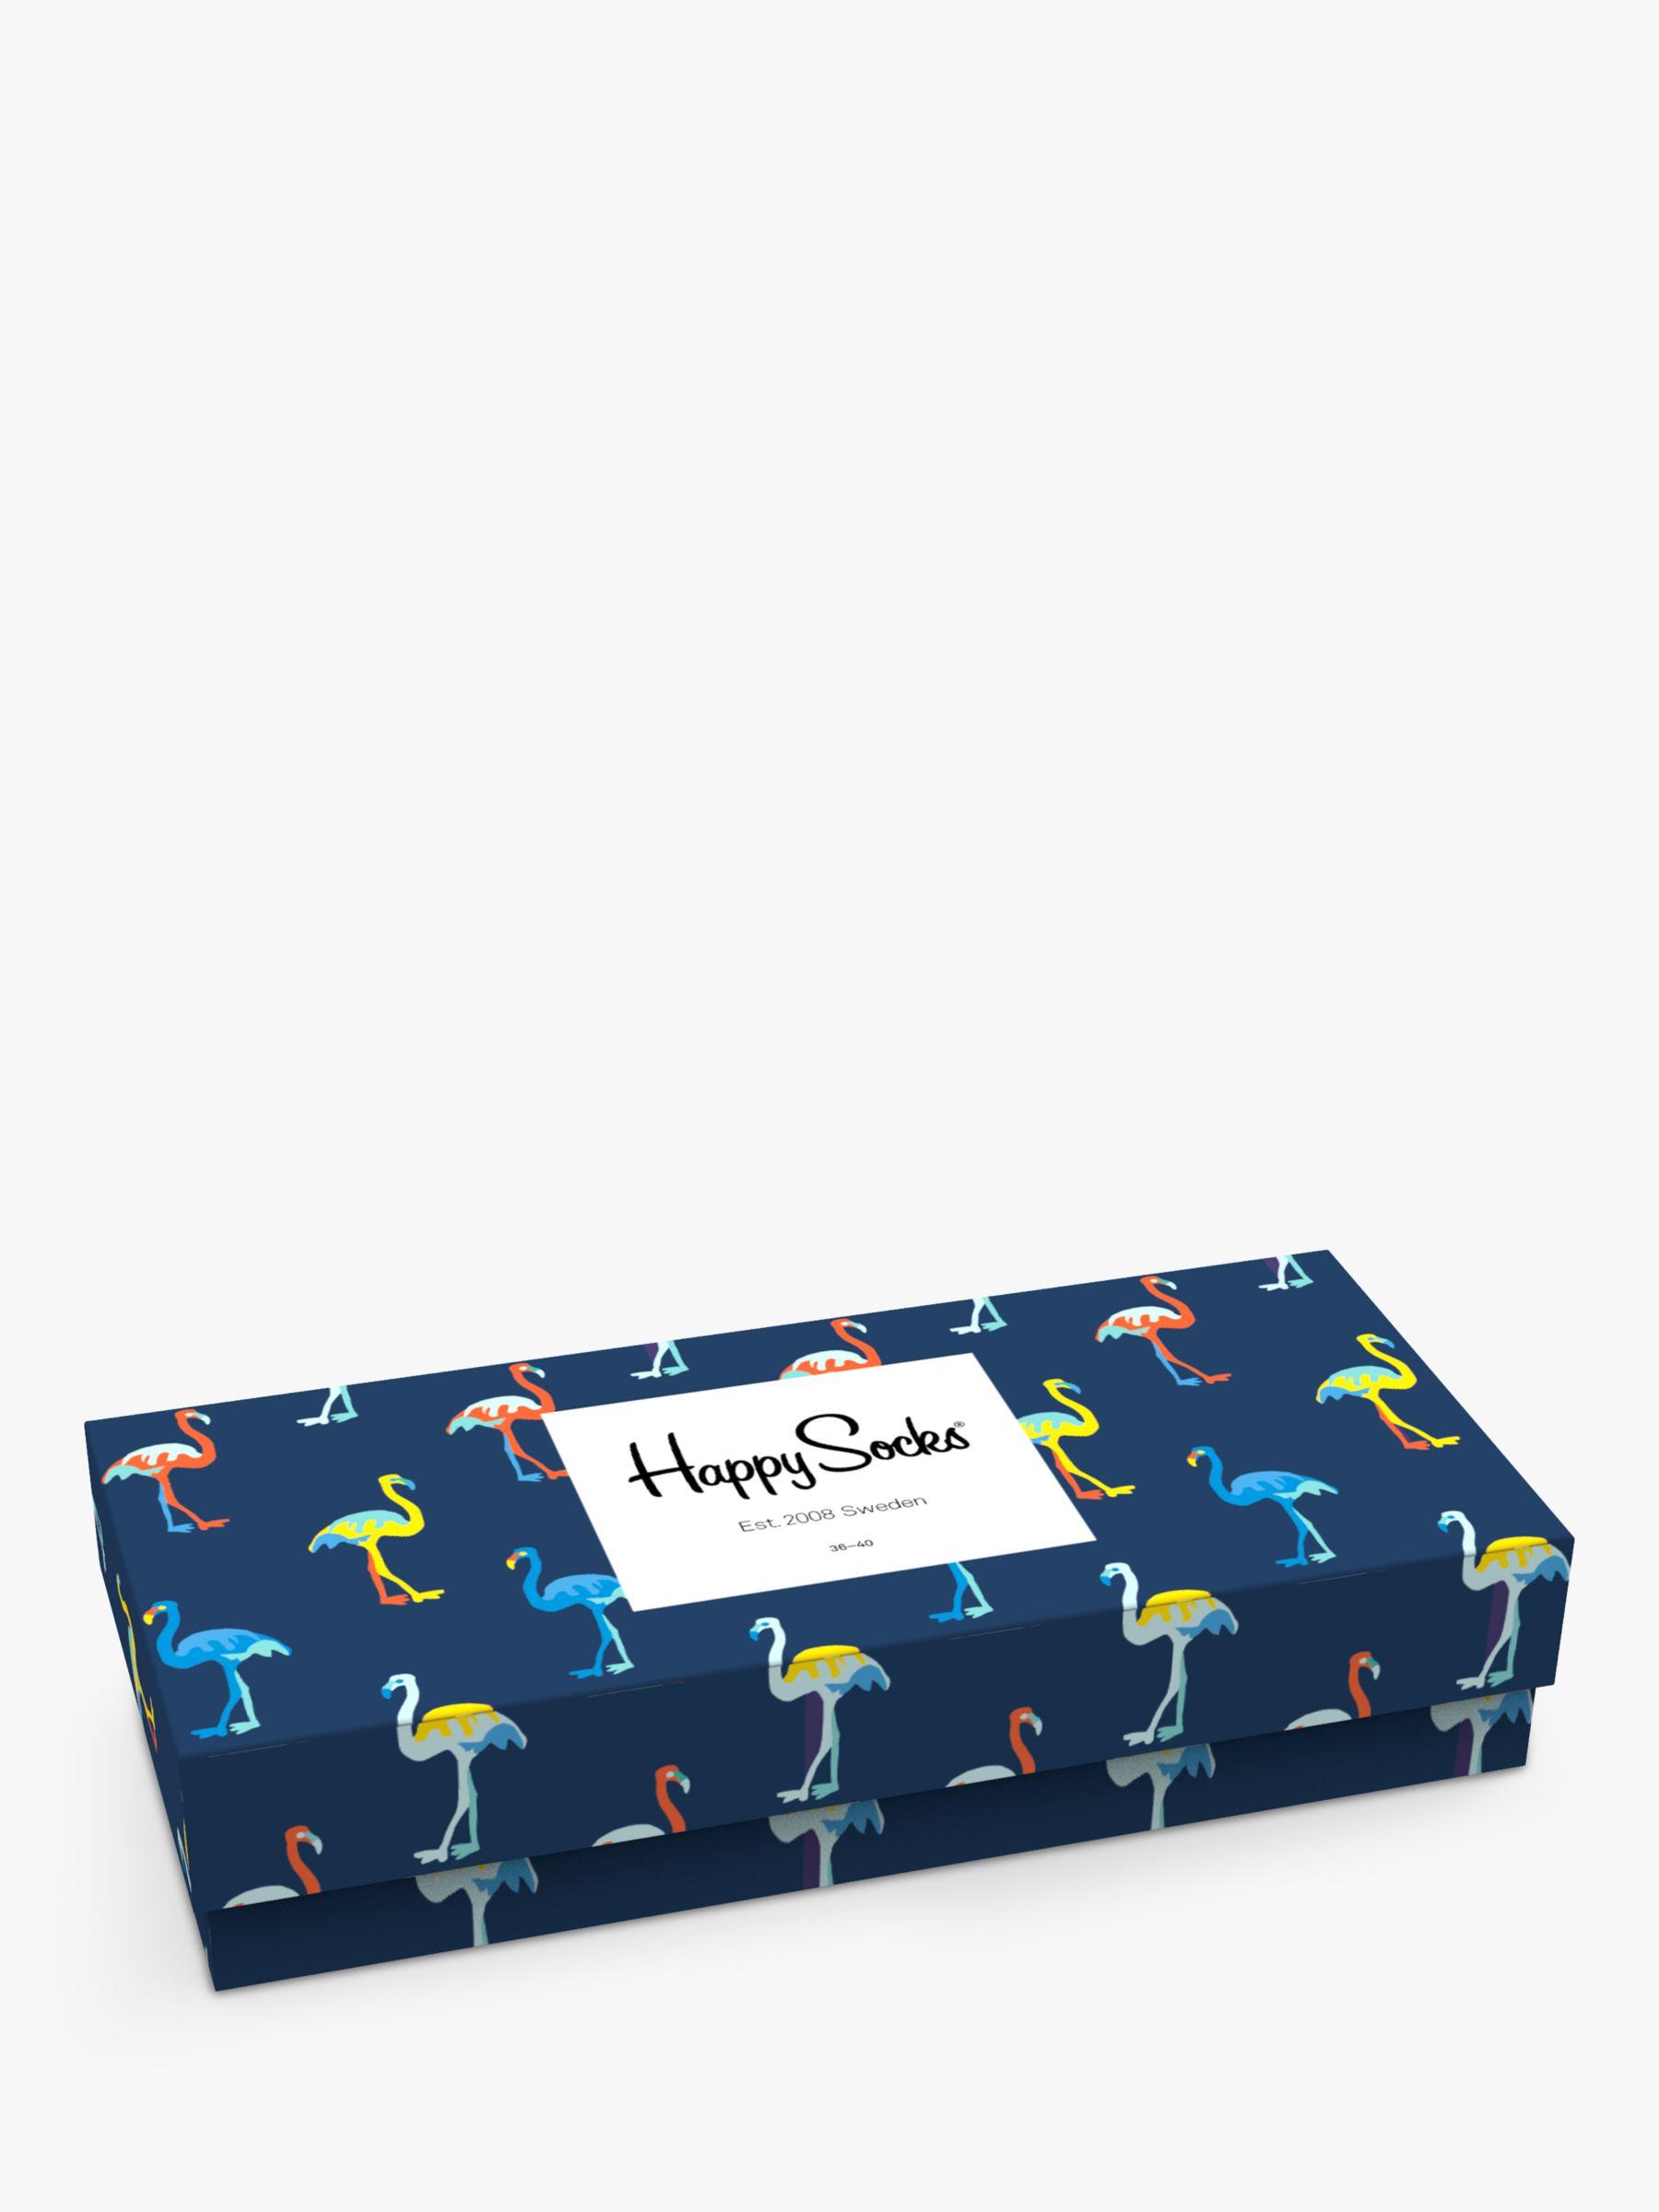 Happy Socks Happy Socks Print Gift Box, Pack of 4, One Size